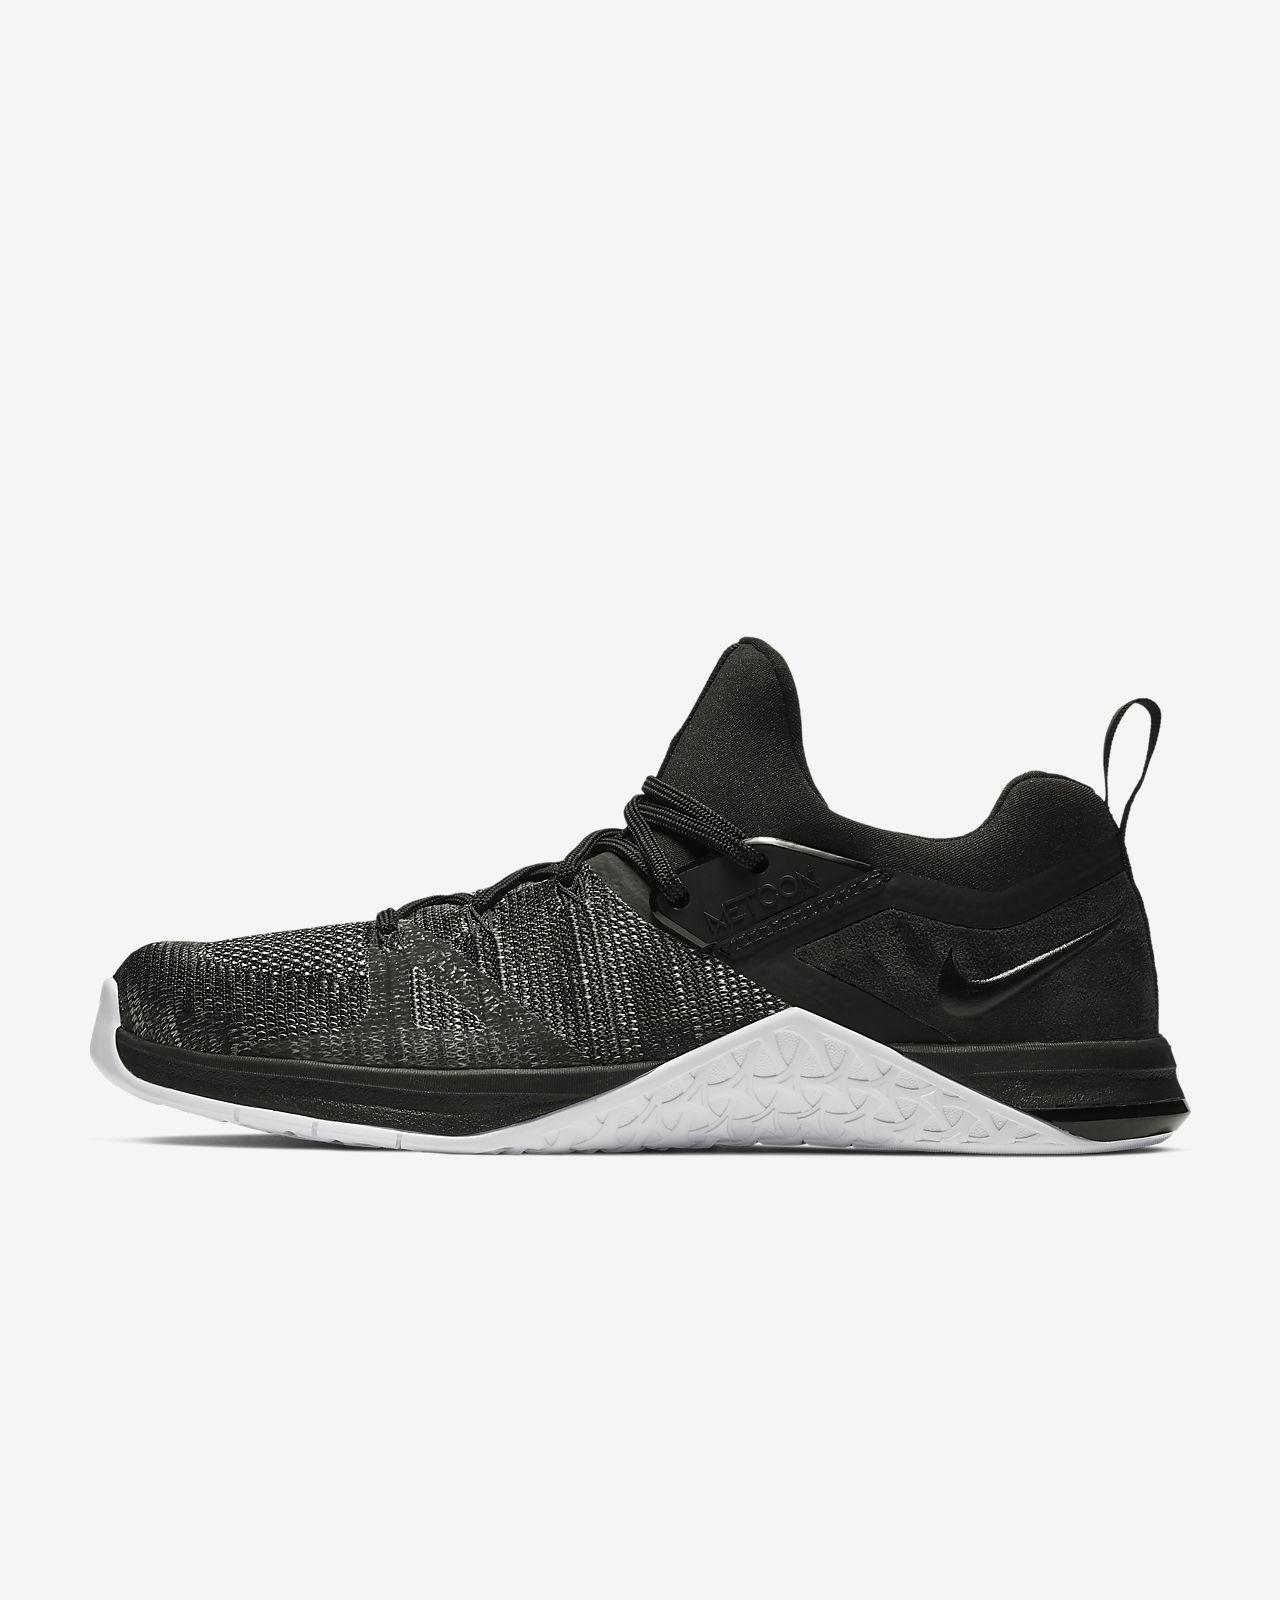 Nike Metcon Flyknit 3 Men's Cross-Training/Weightlifting Shoe